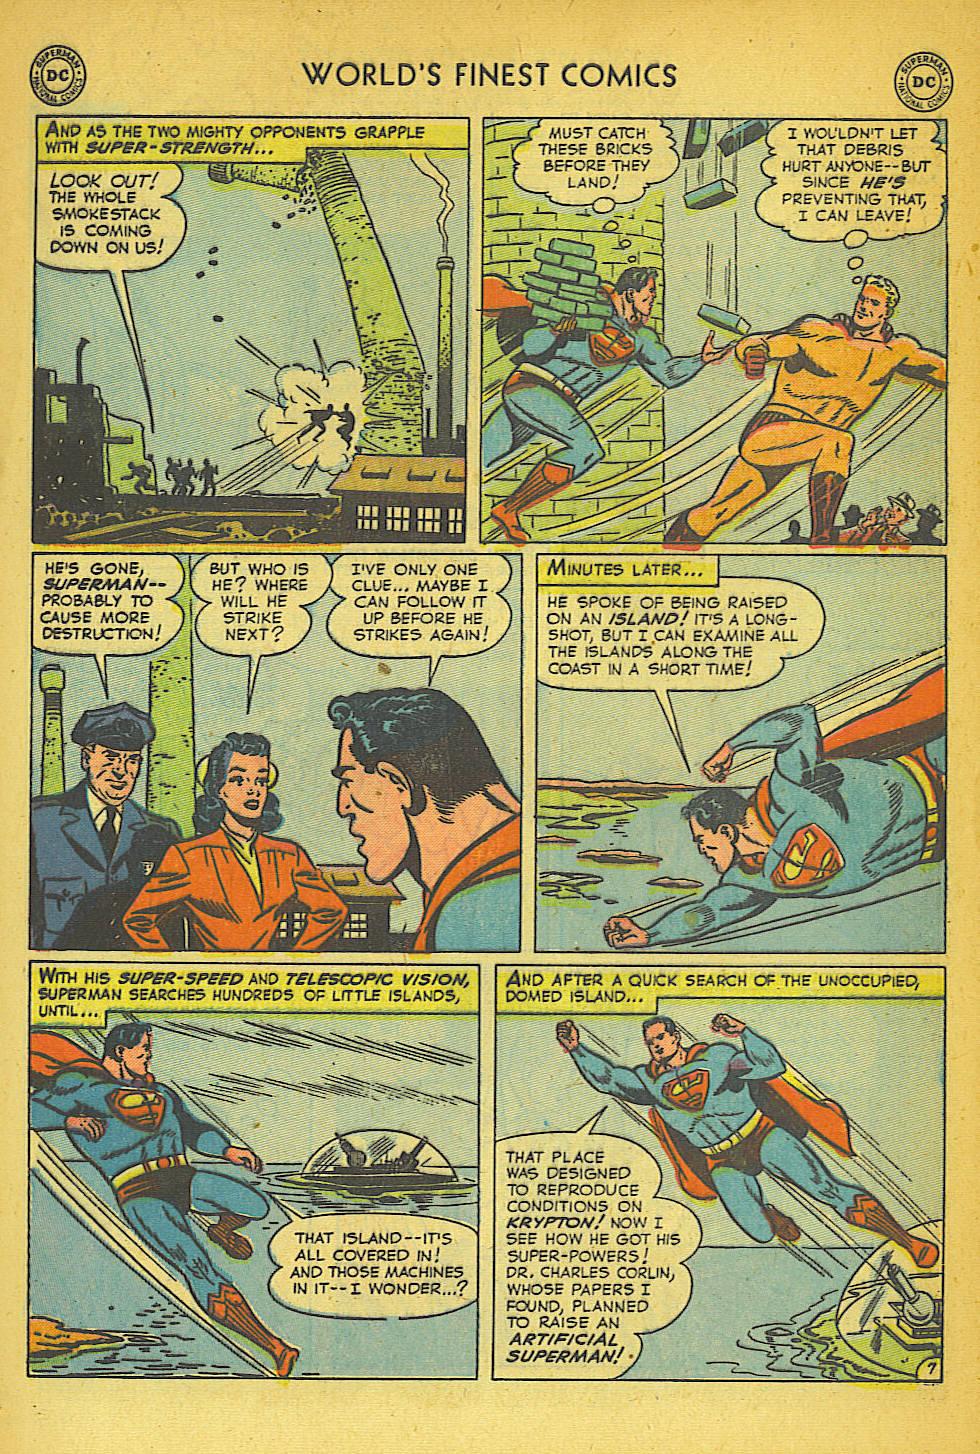 Read online World's Finest Comics comic -  Issue #57 - 9